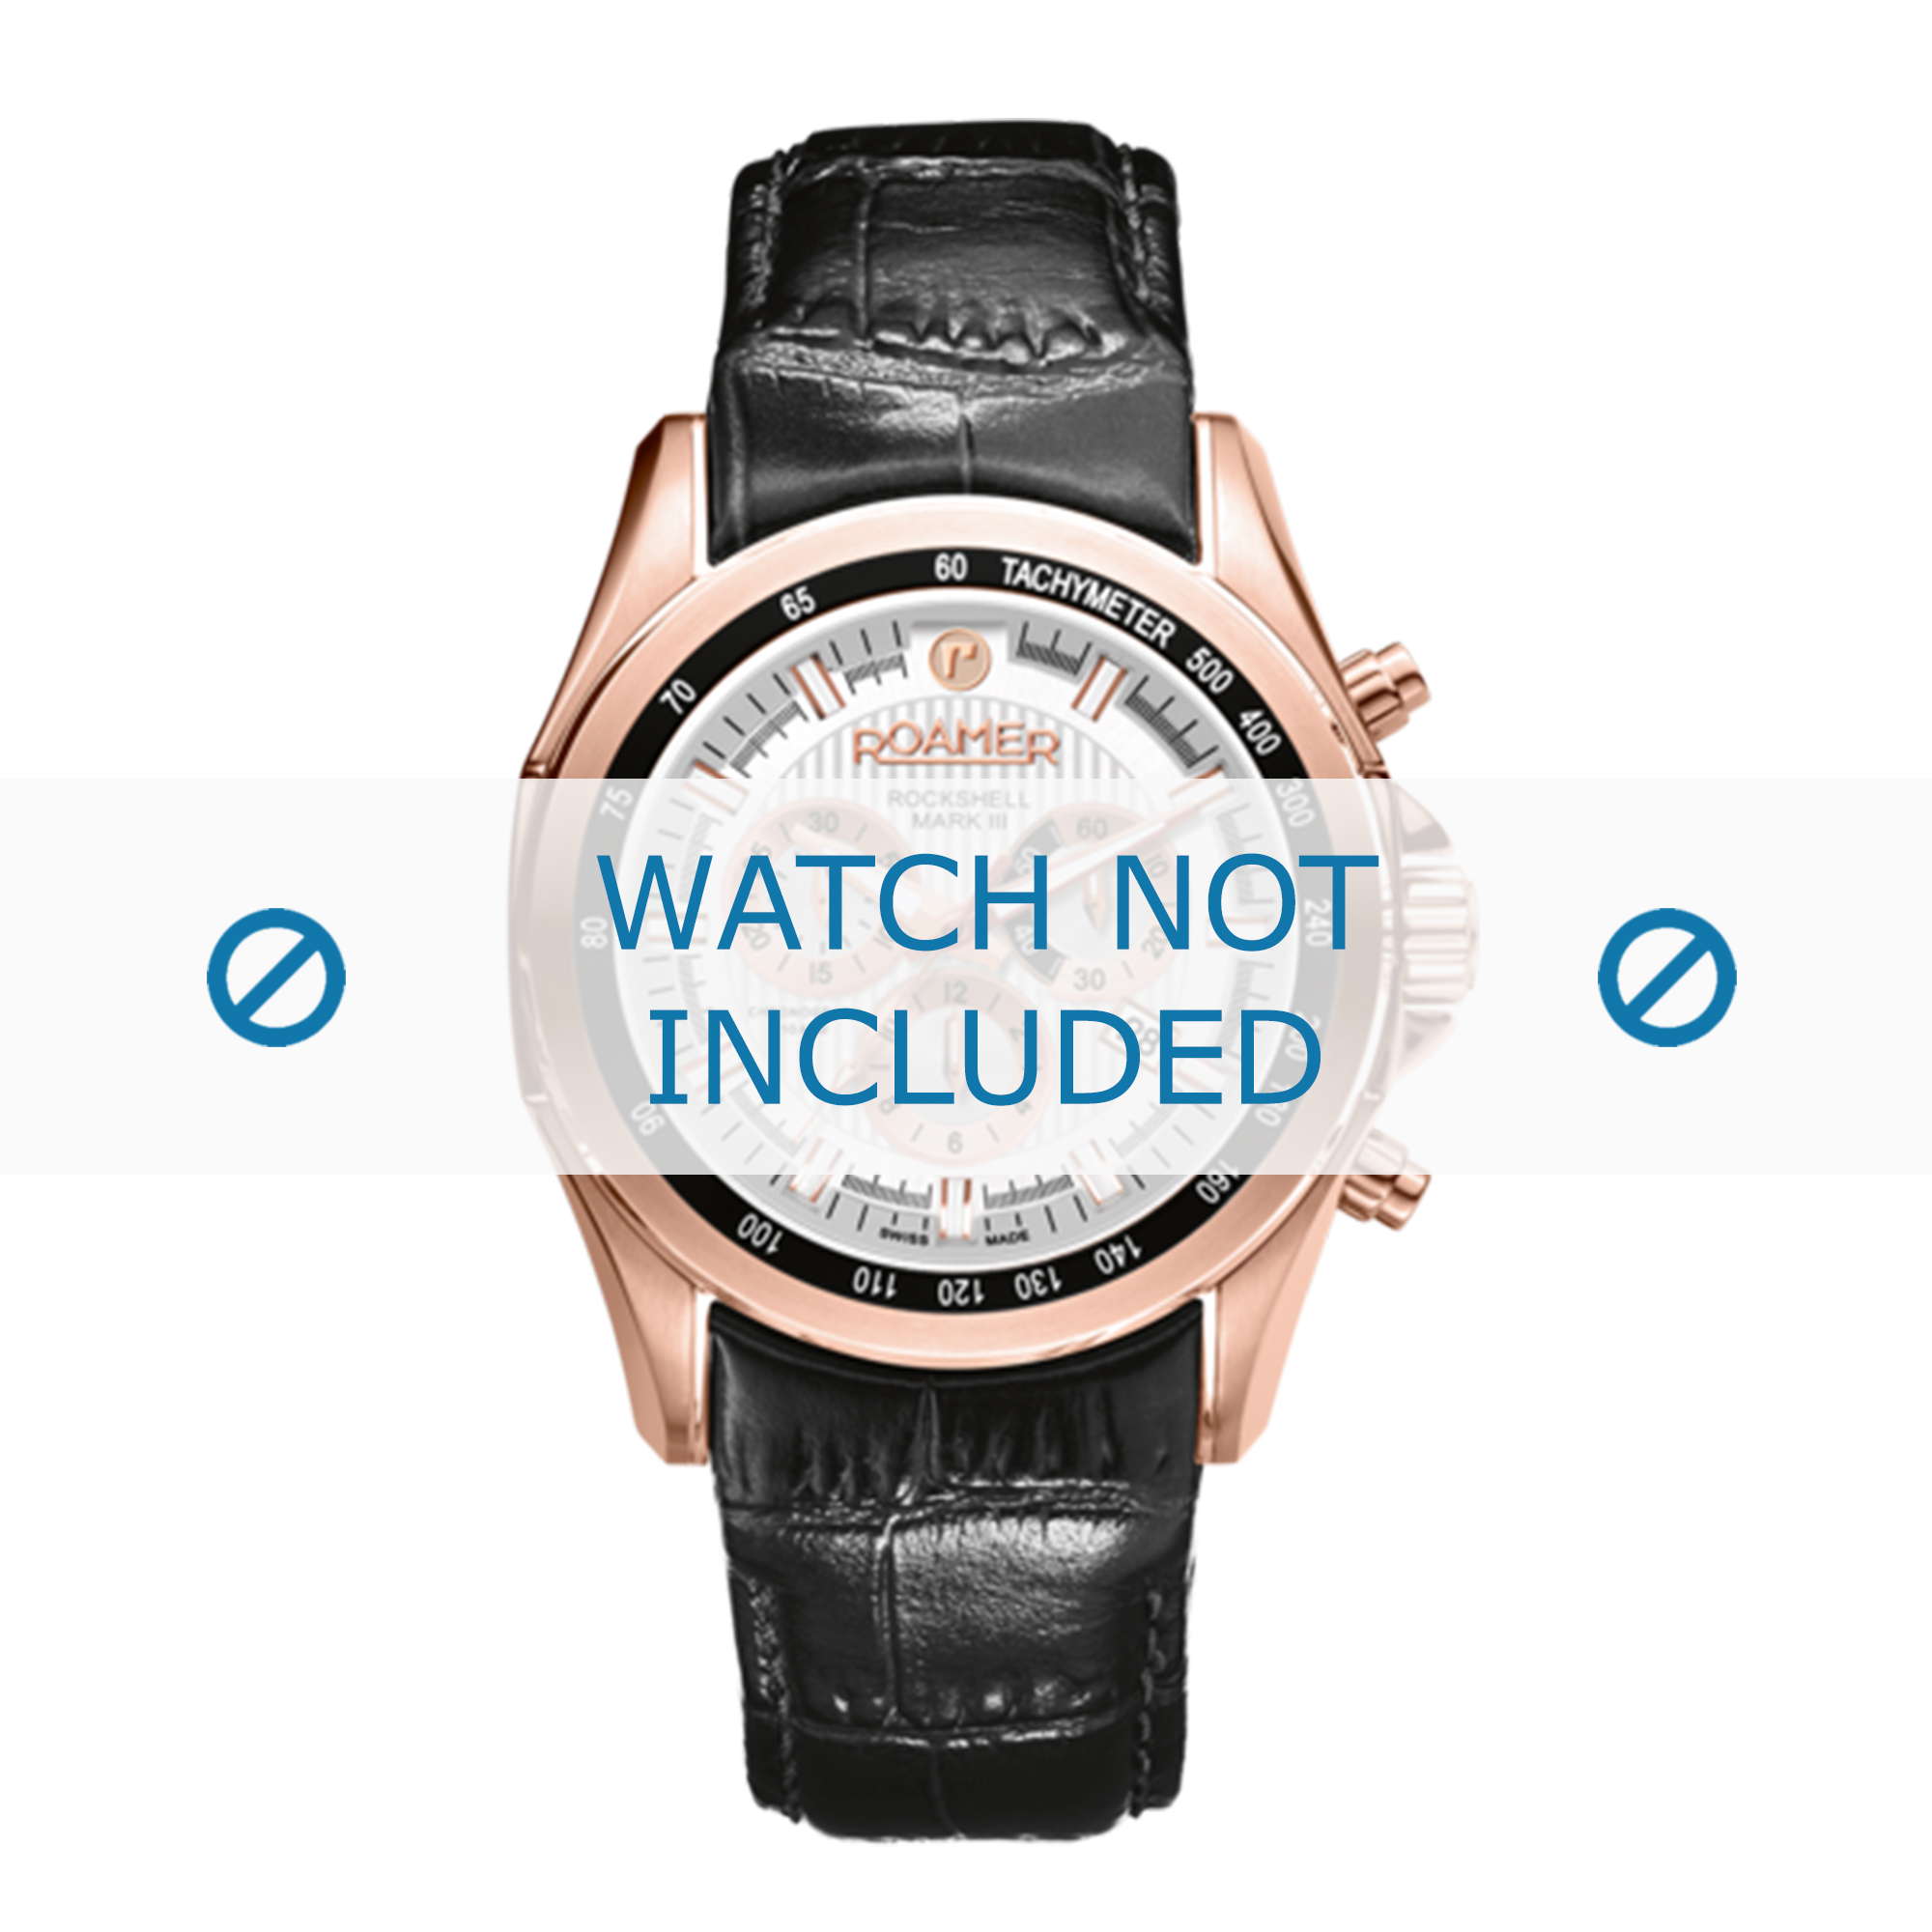 Roamer horlogeband 220837-49-25-02 Leder Zwart 22mm + standaard stiksel